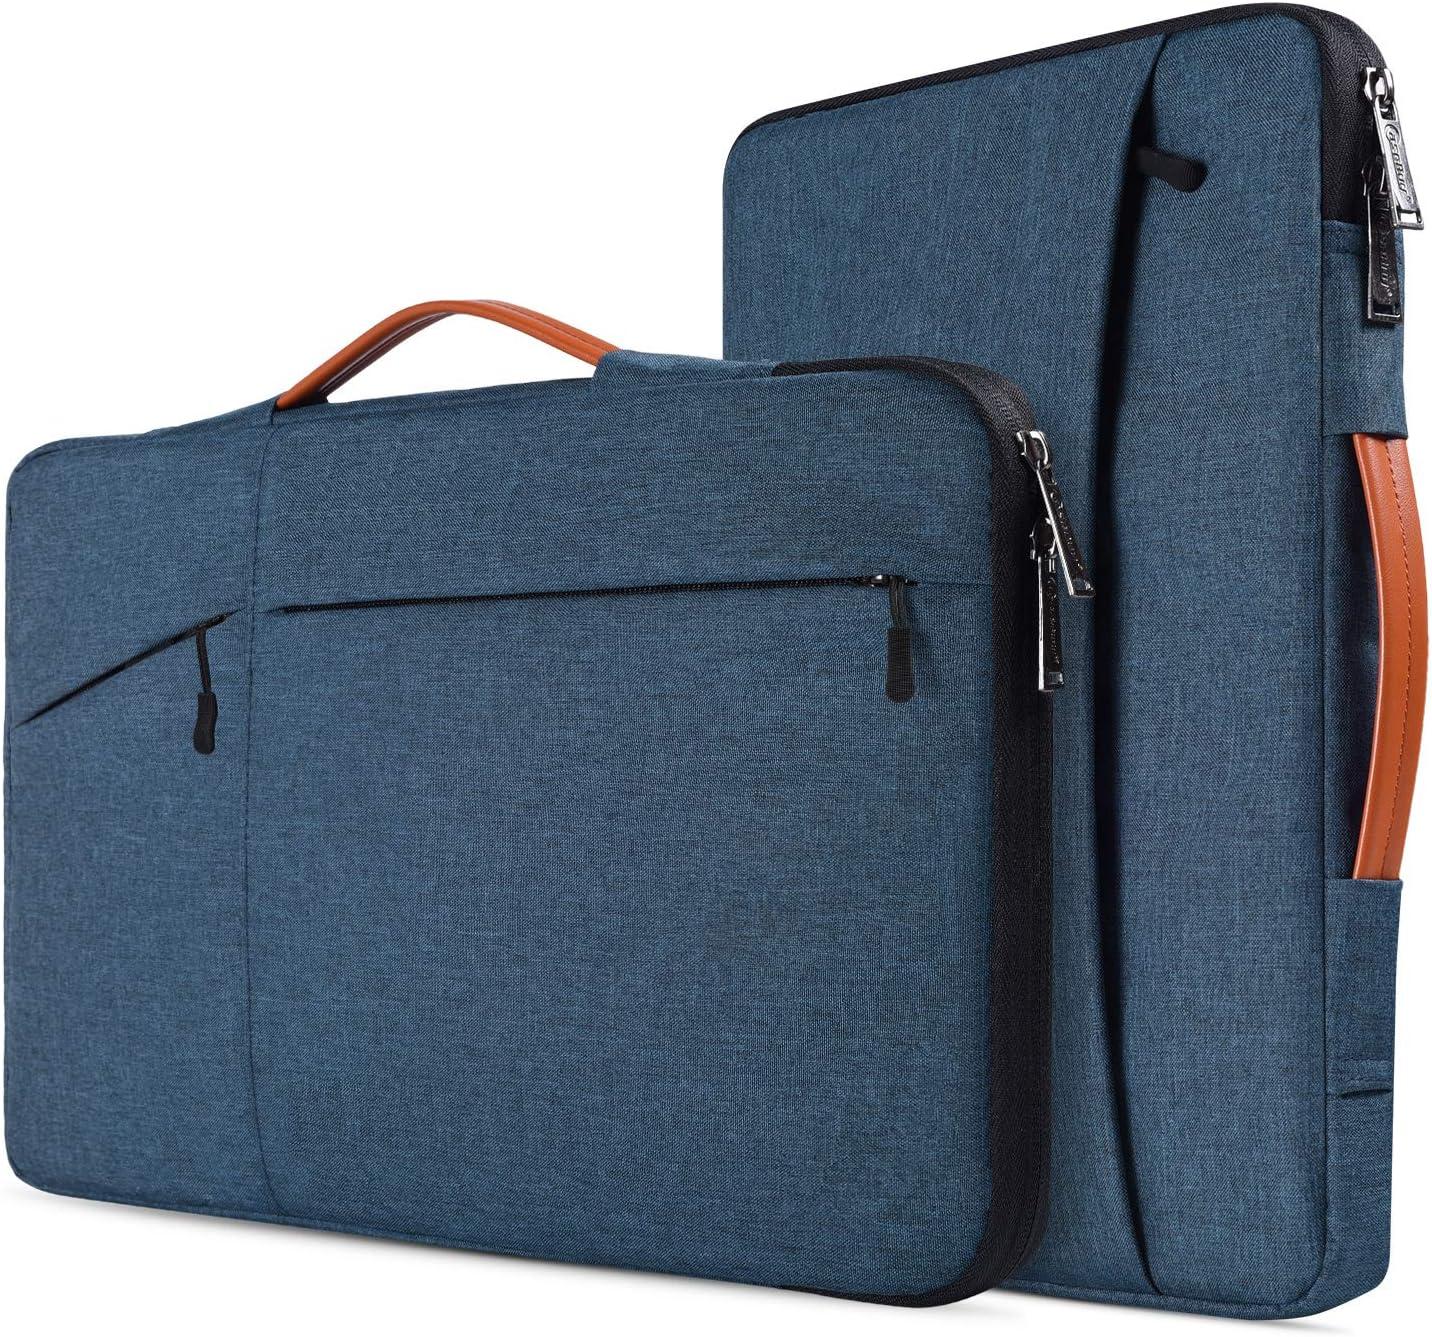 17.3 inch Laptop Briefcase Bag for HP Pavilion 17.3 Inch Laptop,